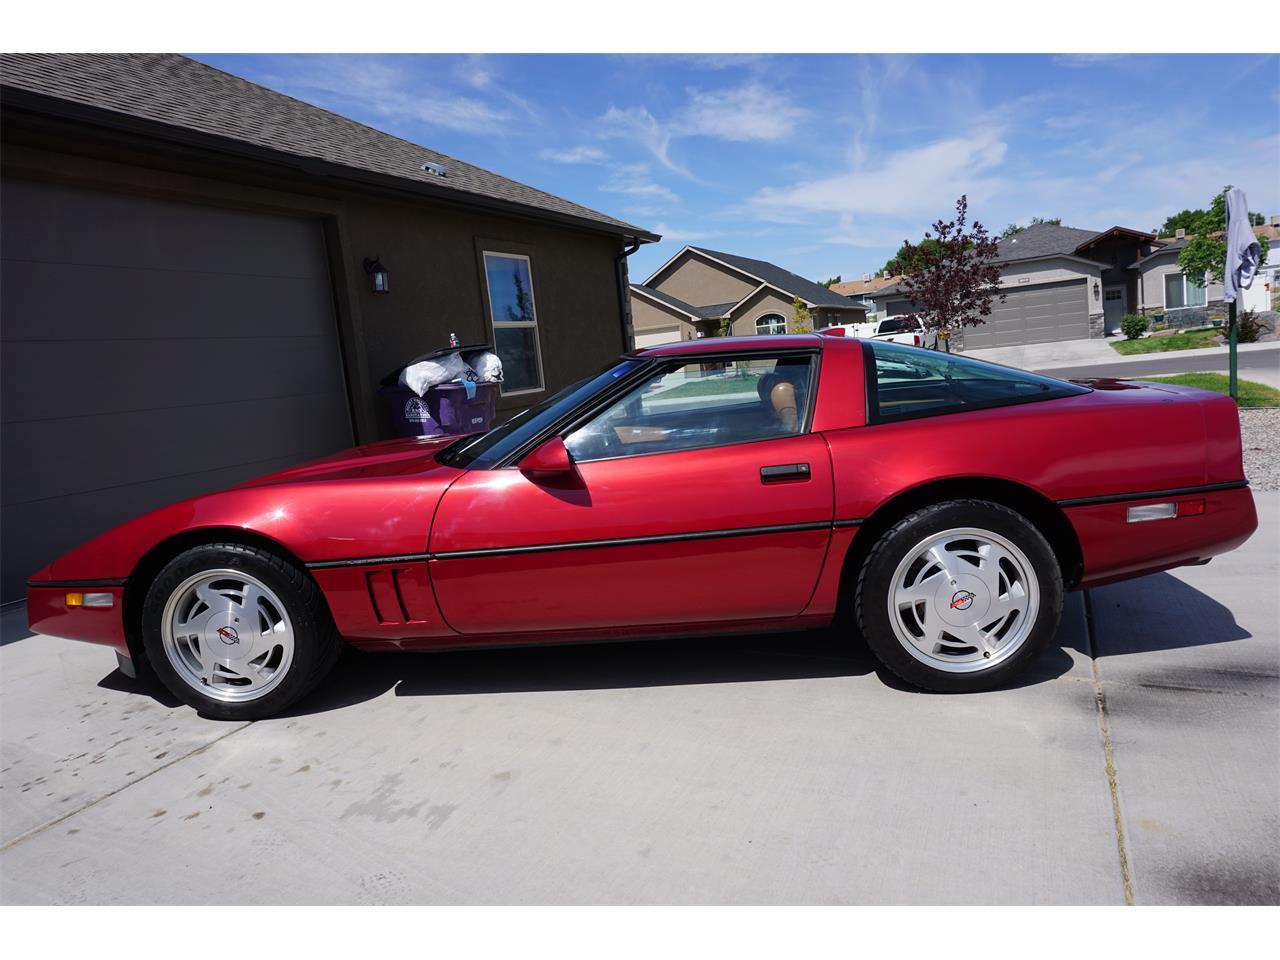 Large Picture of 1989 Corvette C4 located in Grand Junction Colorado - $9,500.00 - QTU6